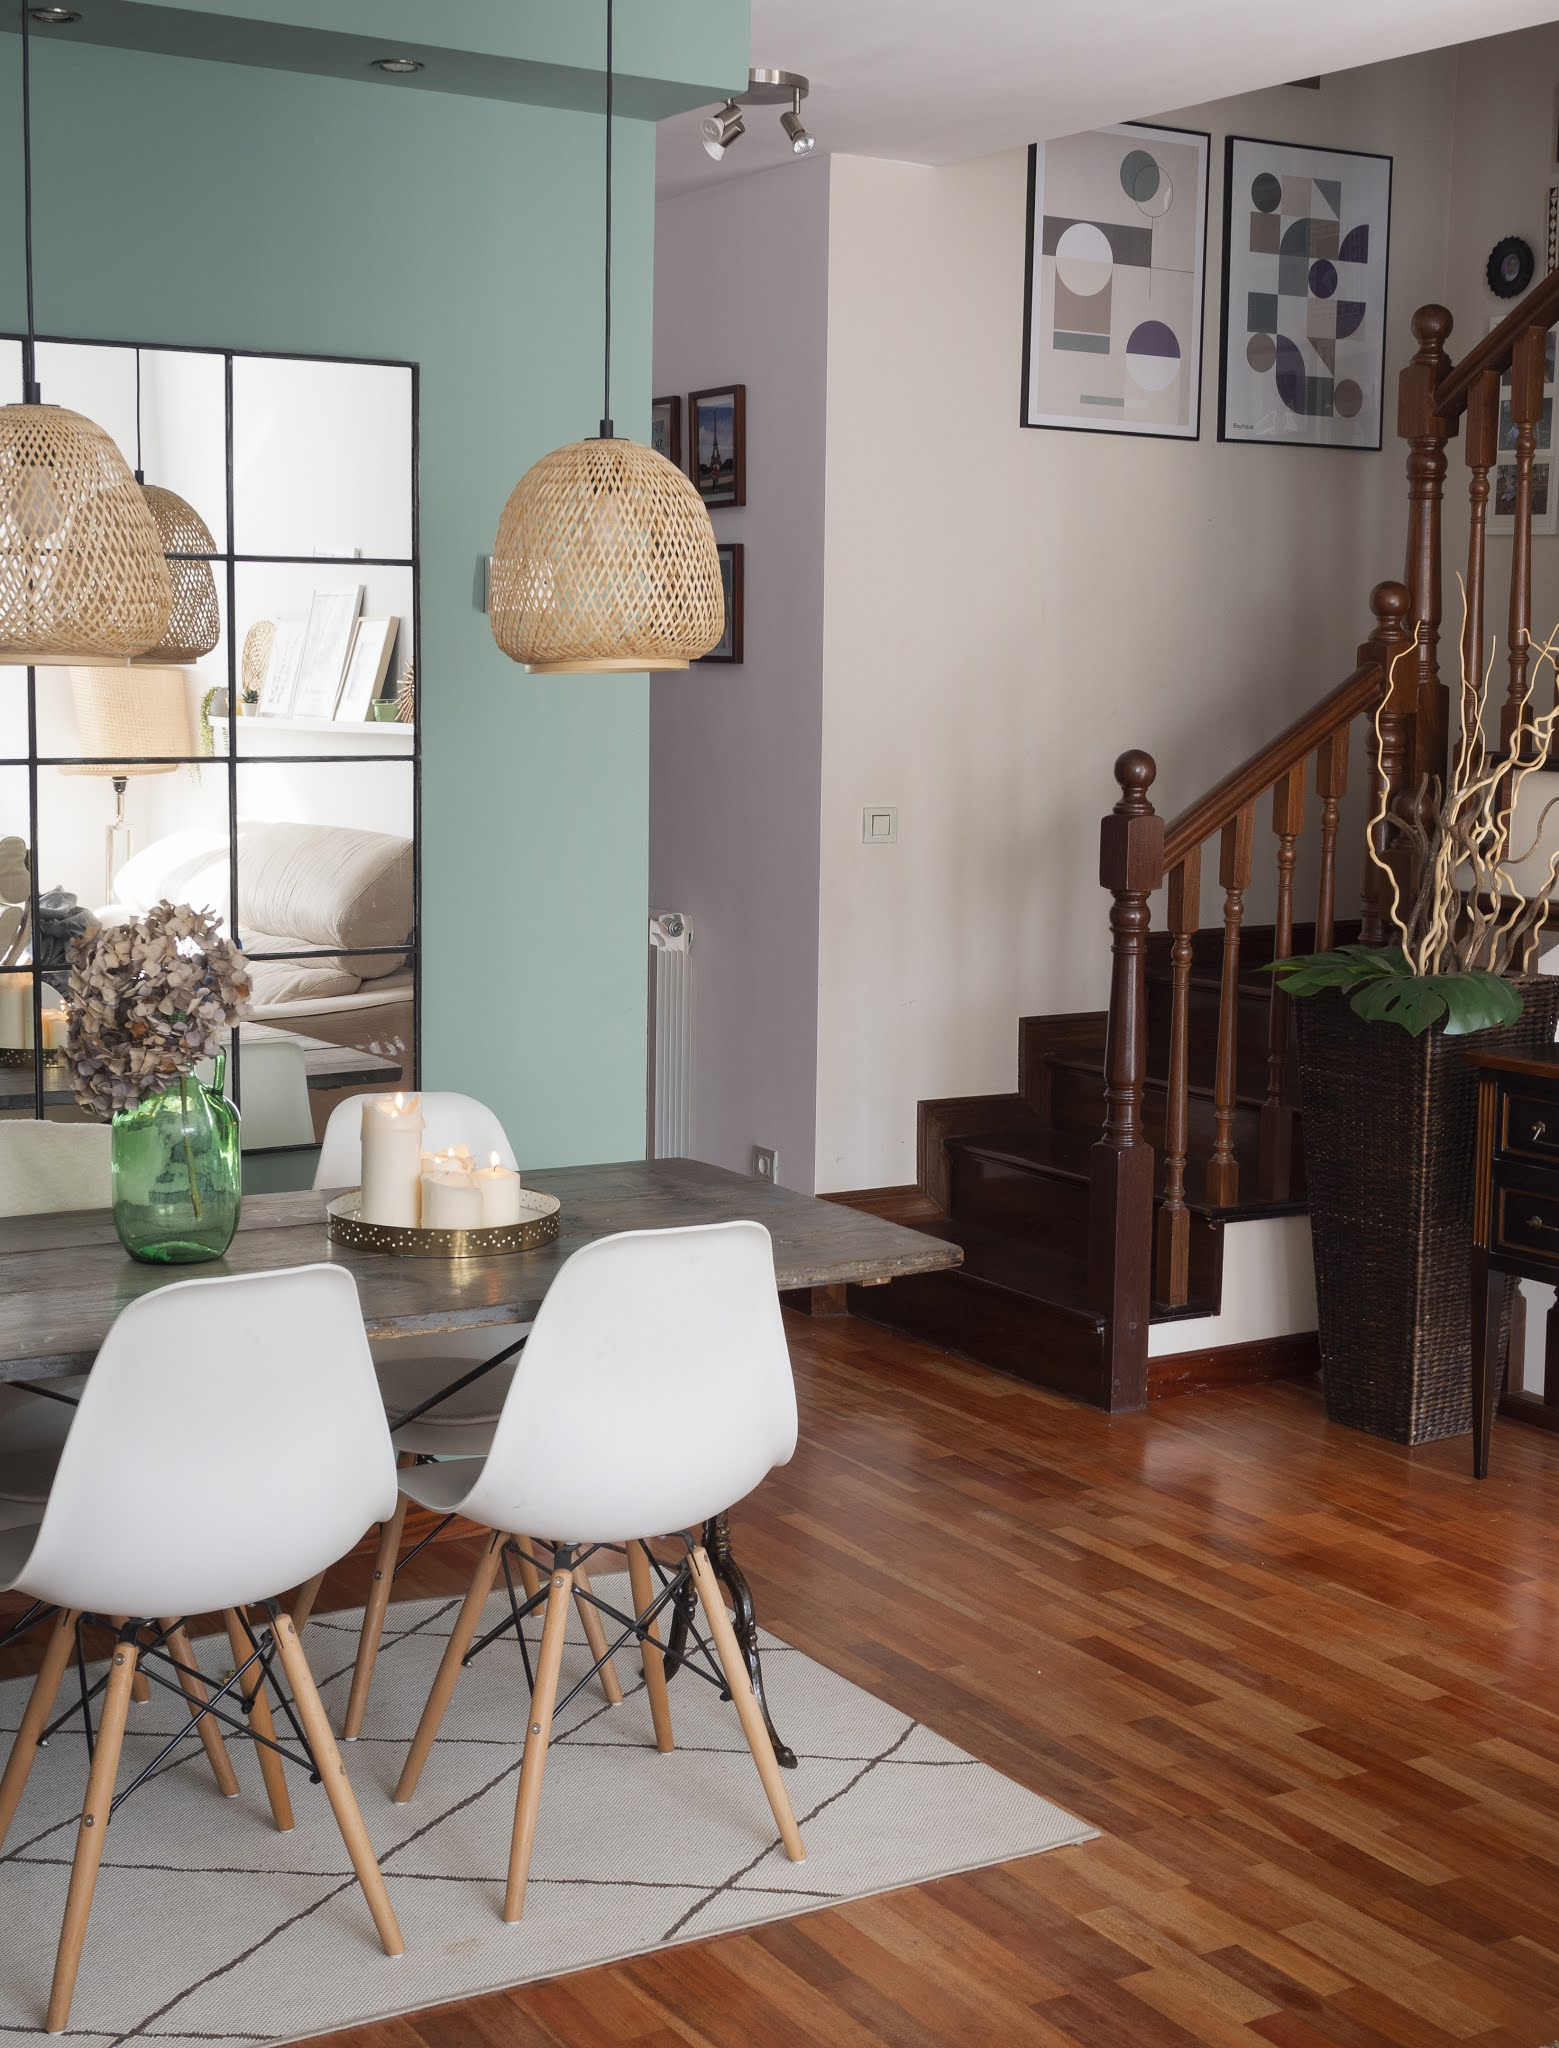 4 trucos para decorar de forma coherente vuestro hogar_11